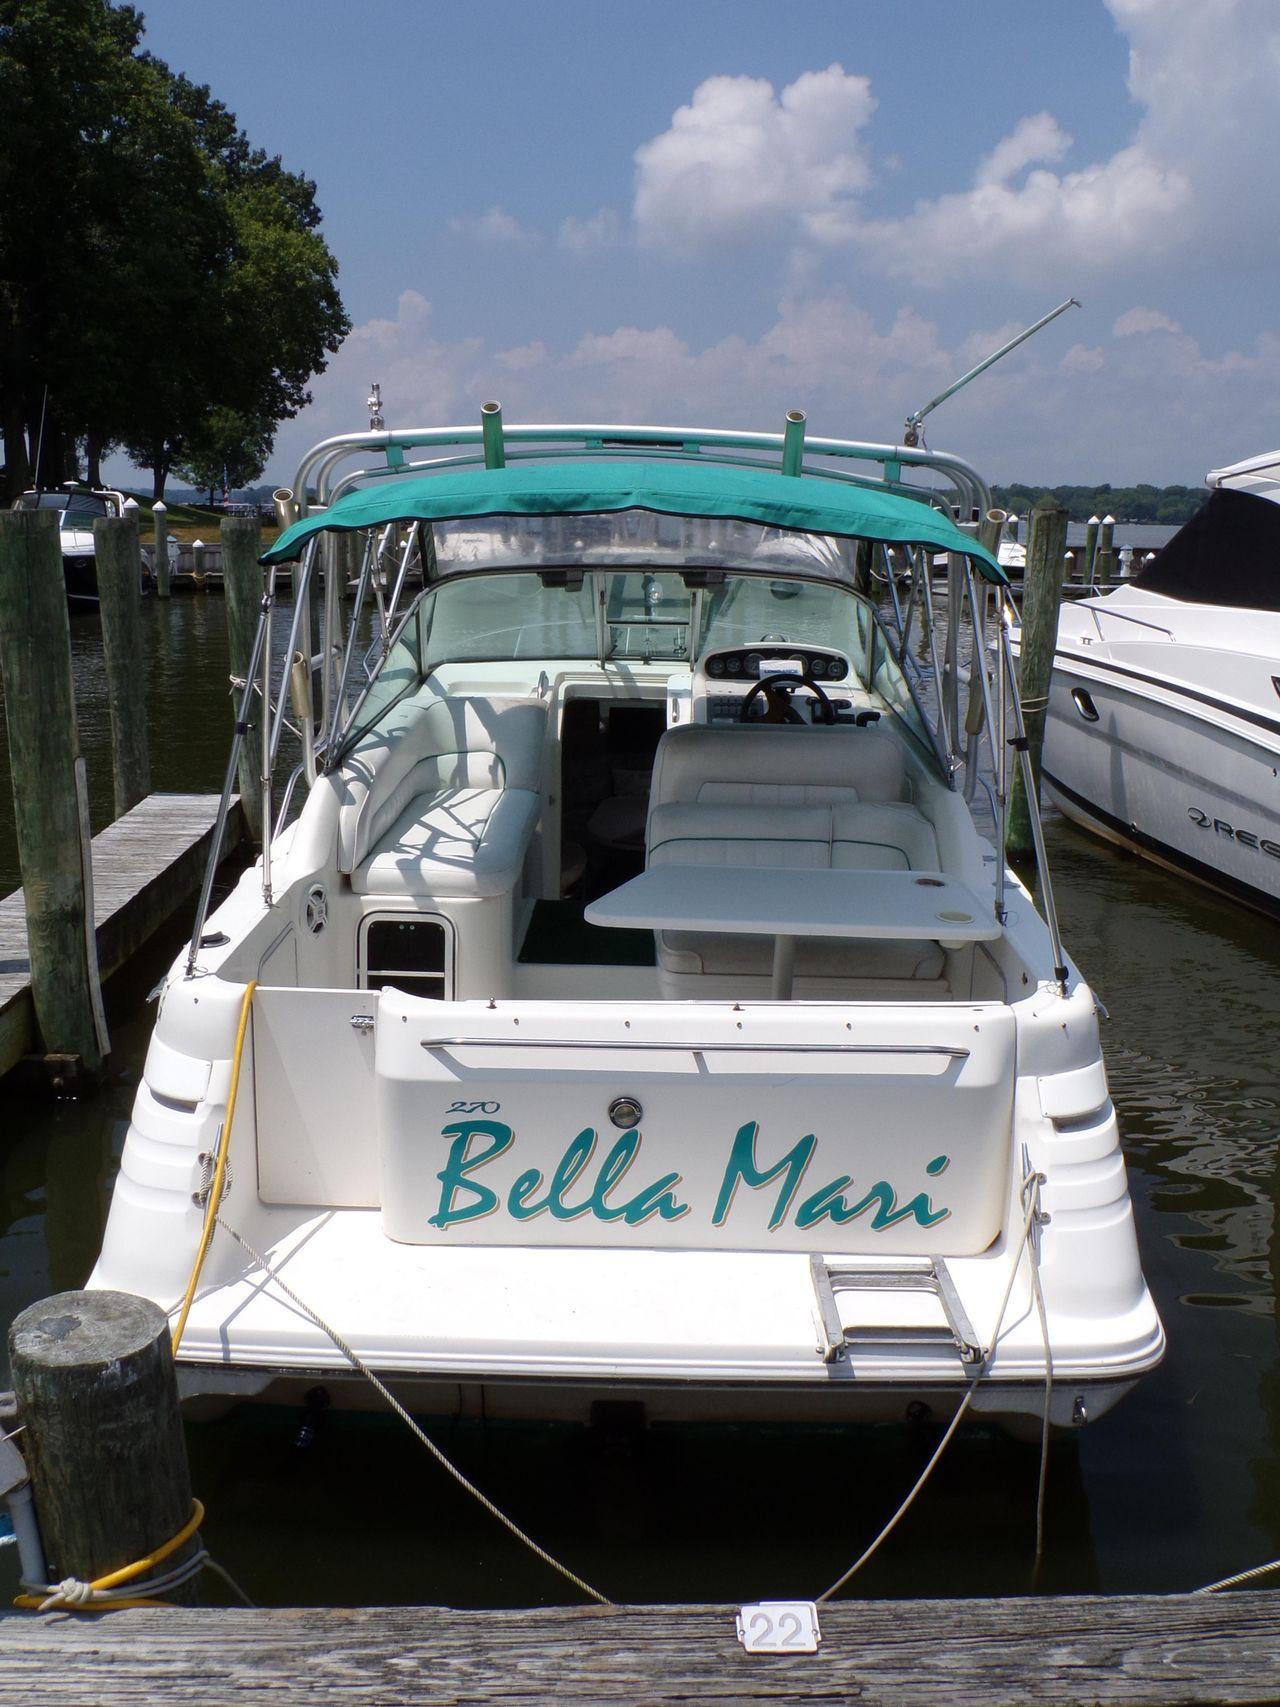 1994 Used Sea Ray Sundancer Cruiser Boat For Sale - $14,500